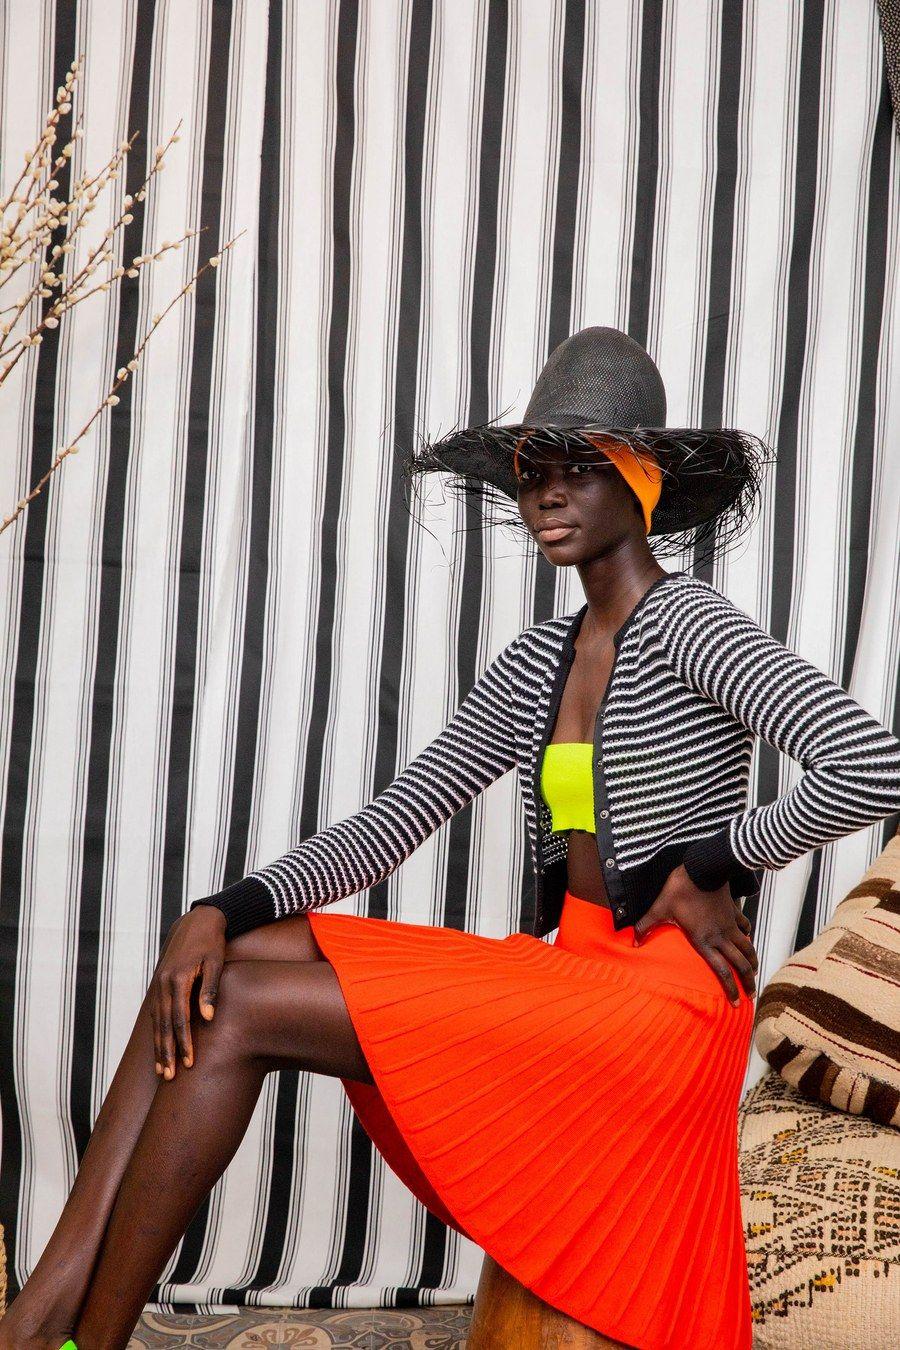 Fashion Show Glemaud Victor 2019 Высокое Pinterest Шитье Resort pqnO7wtS